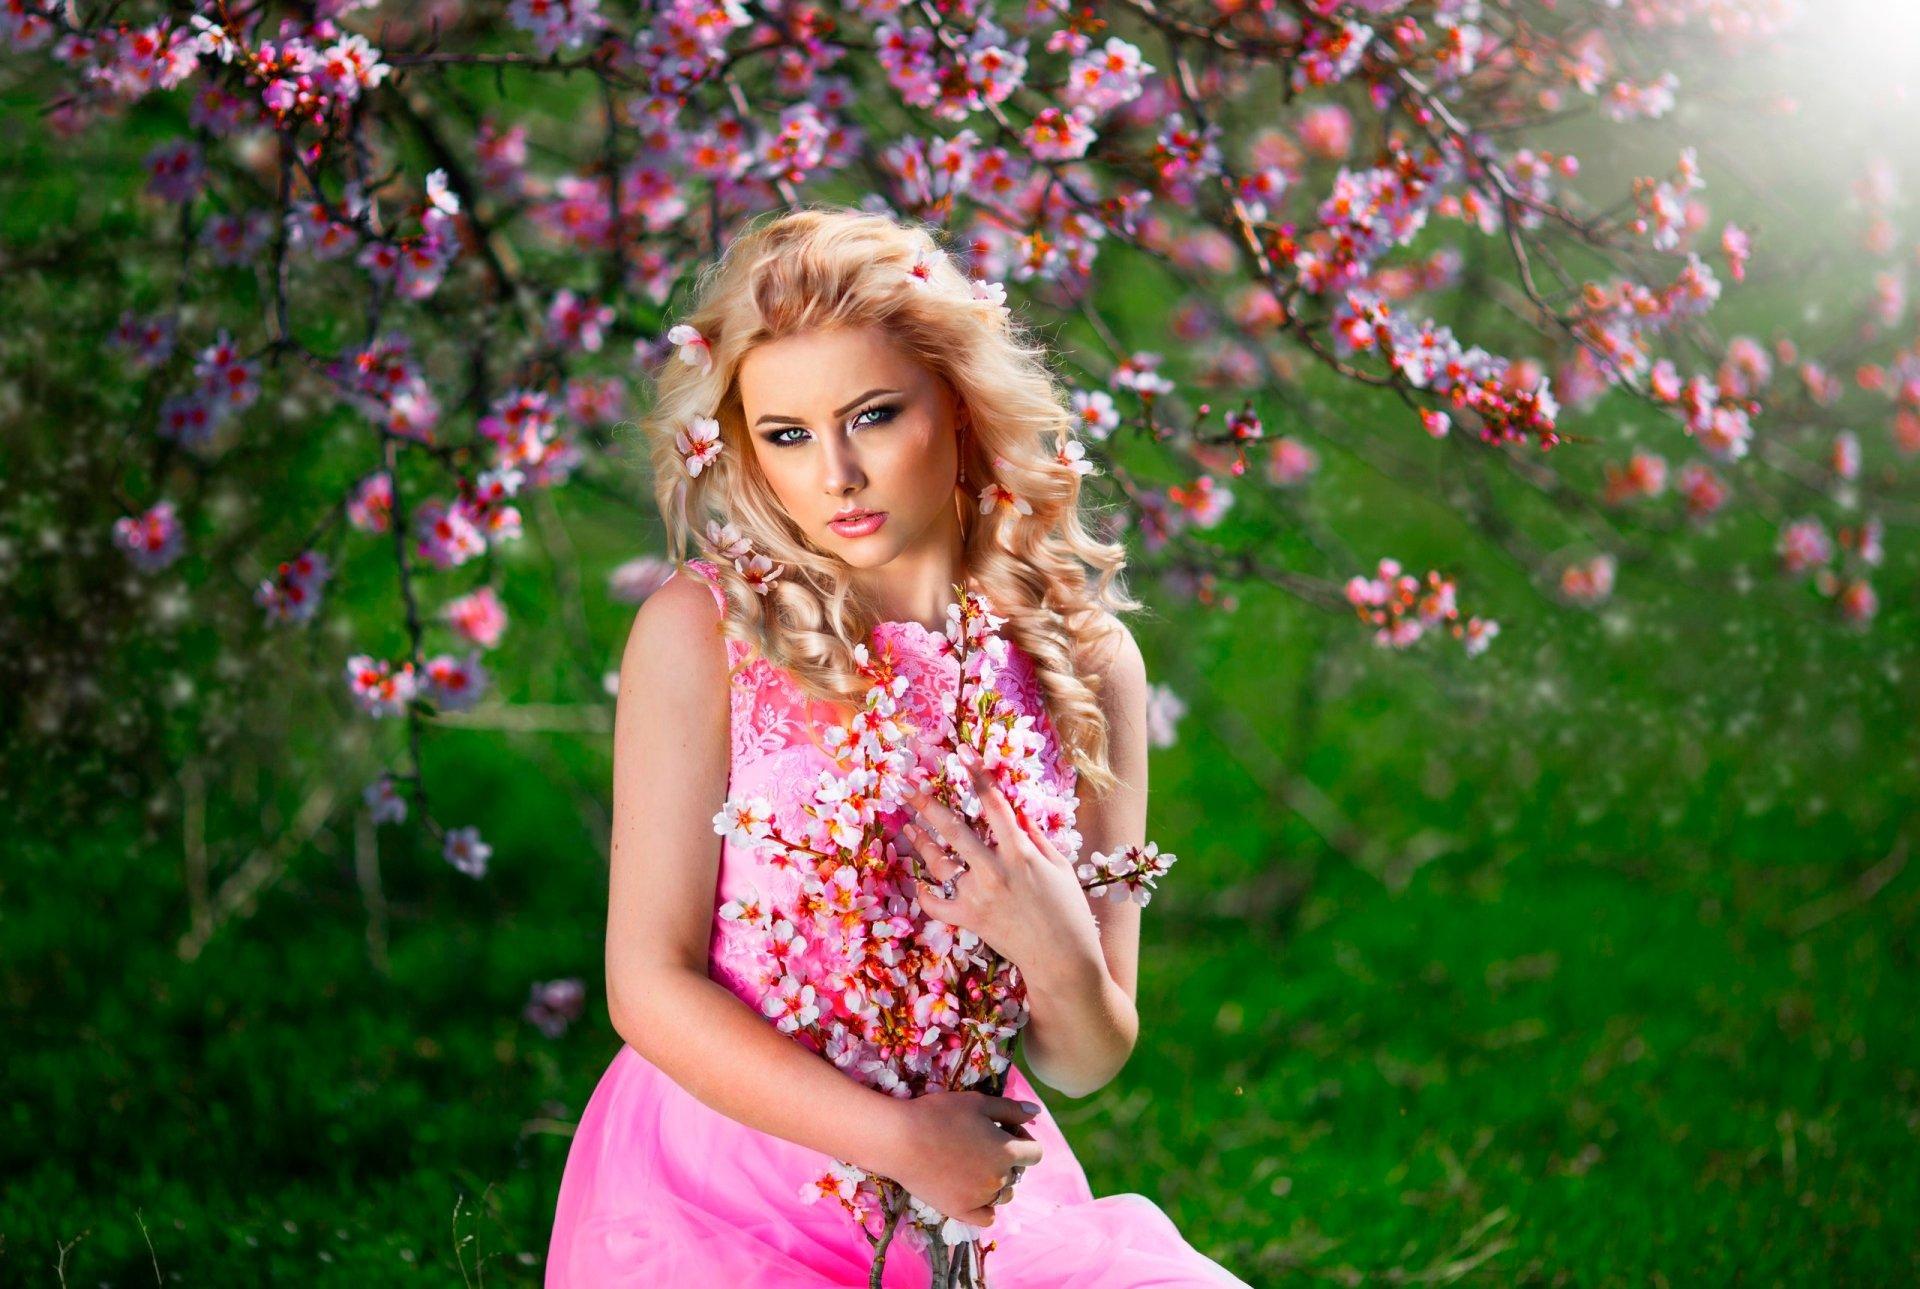 Women - Model  Woman Girl Blonde Green Eyes Pink Dress Blossom Depth Of Field Flower Pink Flower Wallpaper